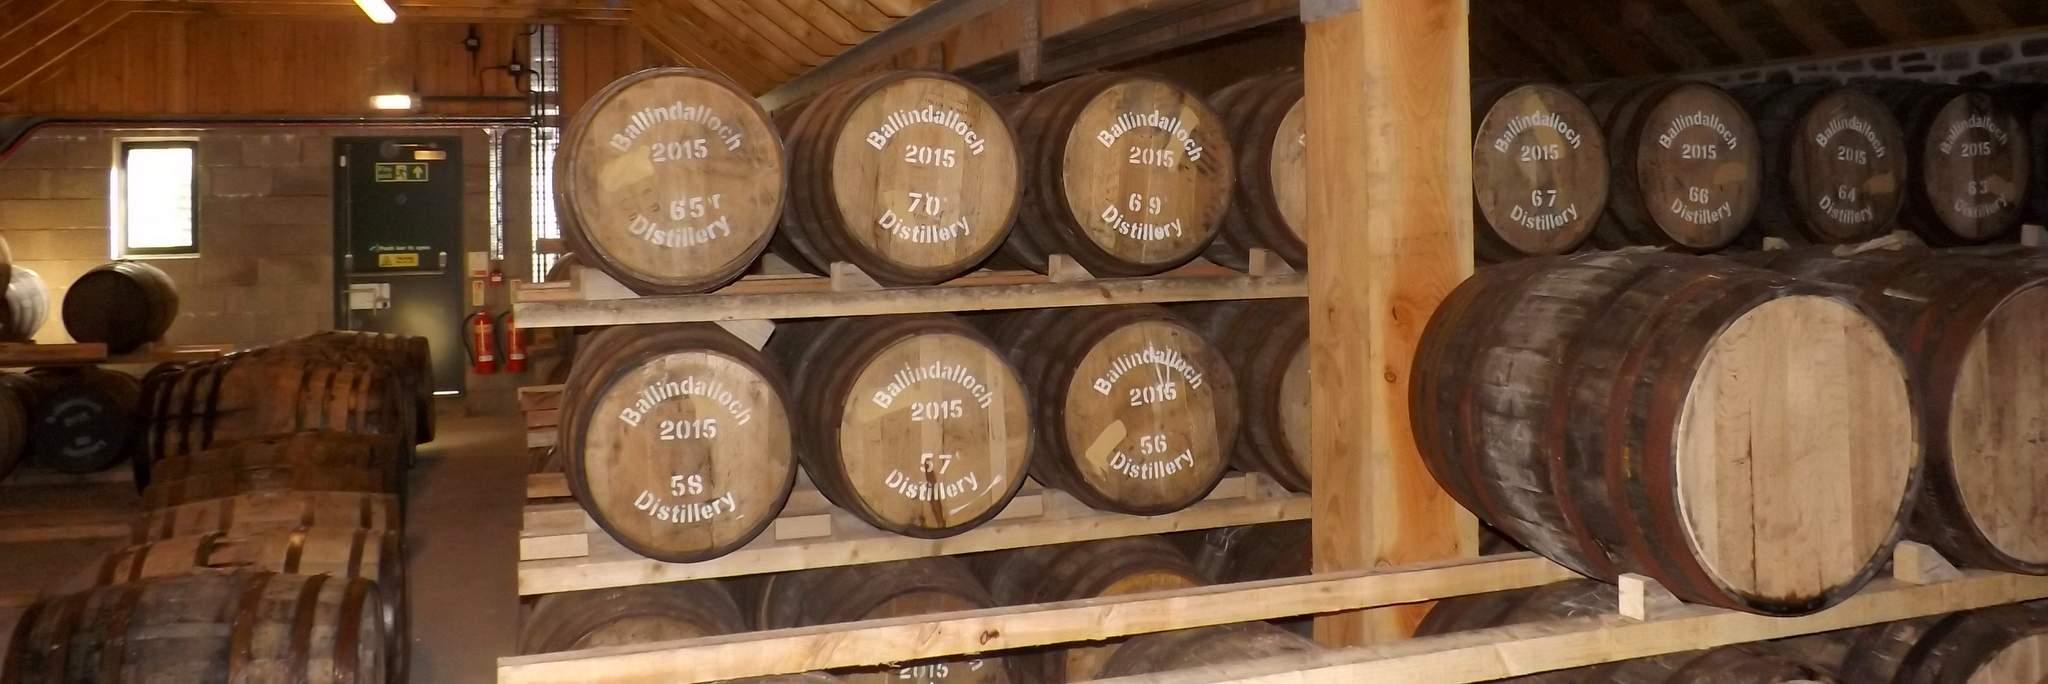 Whisky in Glasgow,